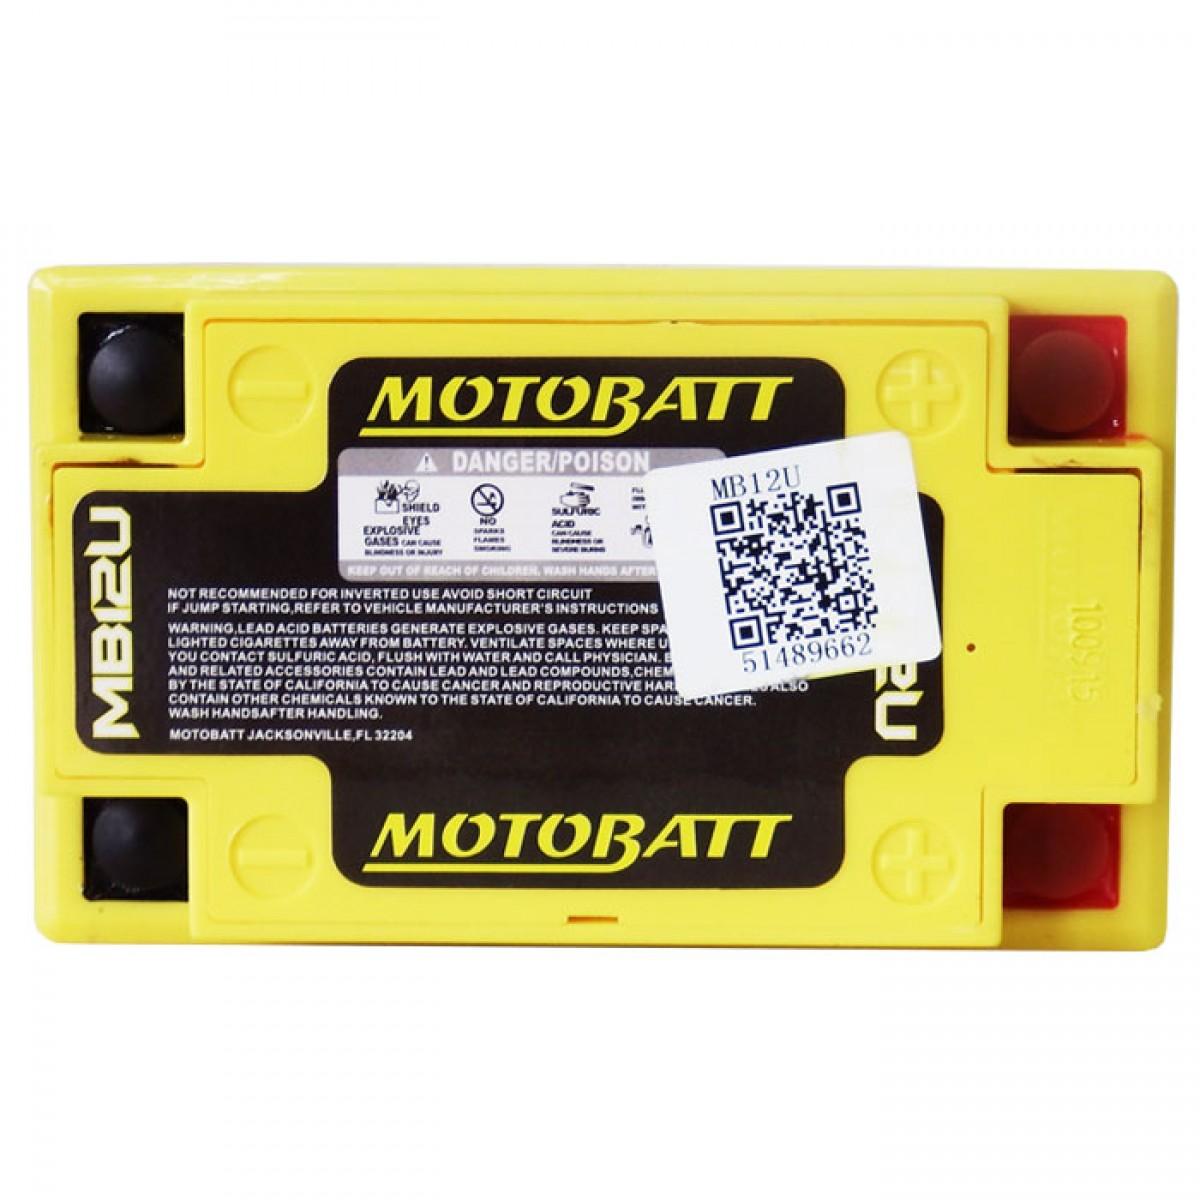 bateria MB12U motobatt